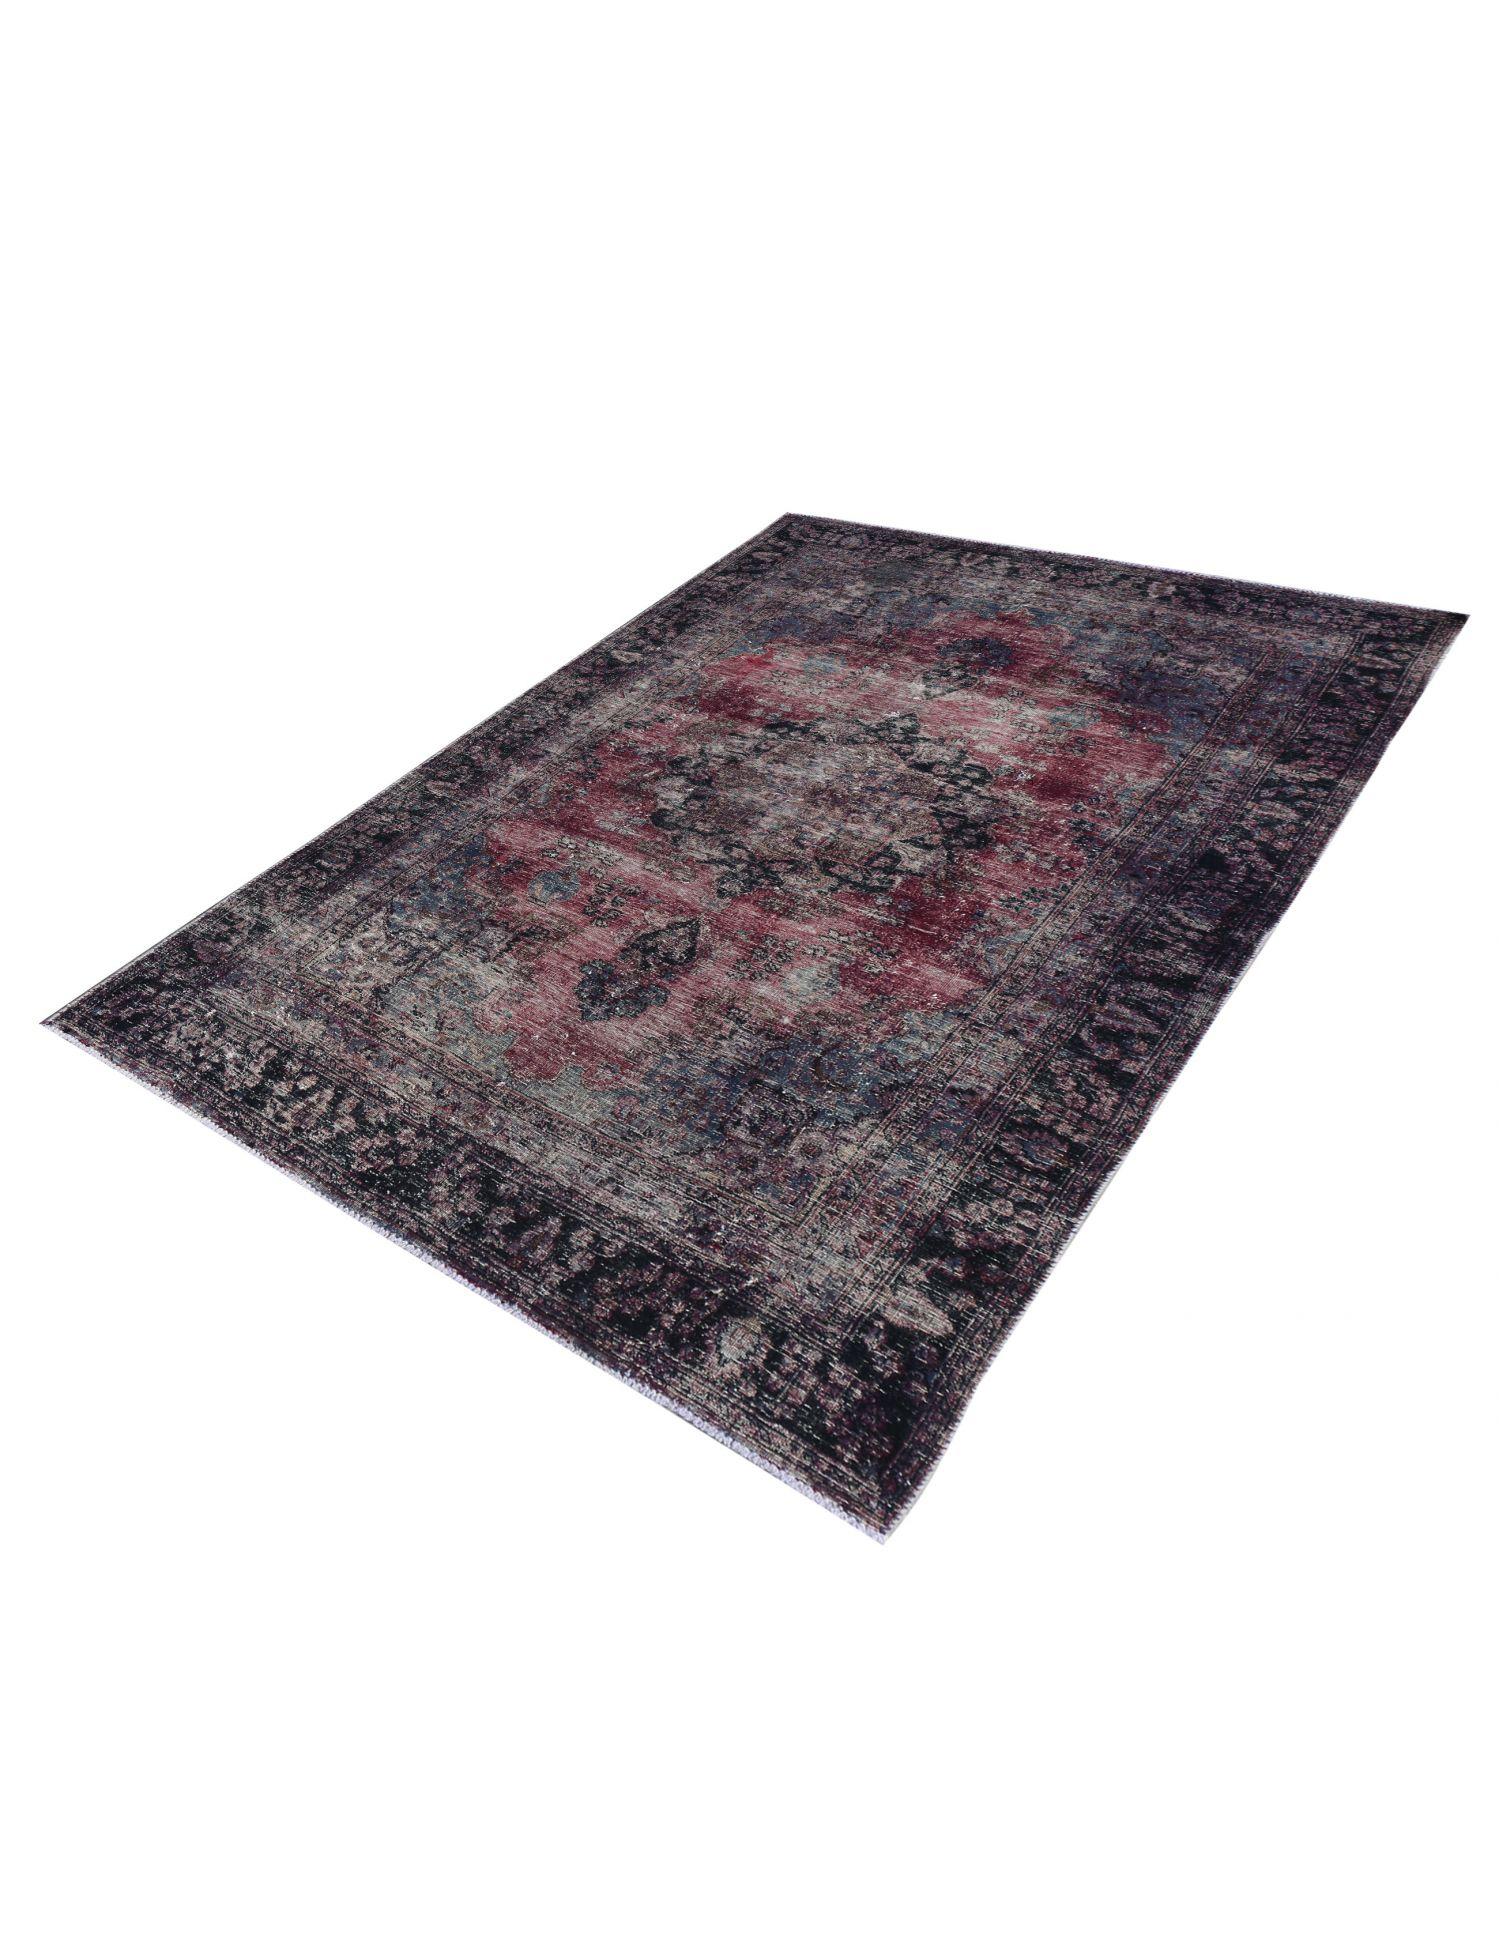 Vintage Carpet  violetti <br/>270 x 175 cm